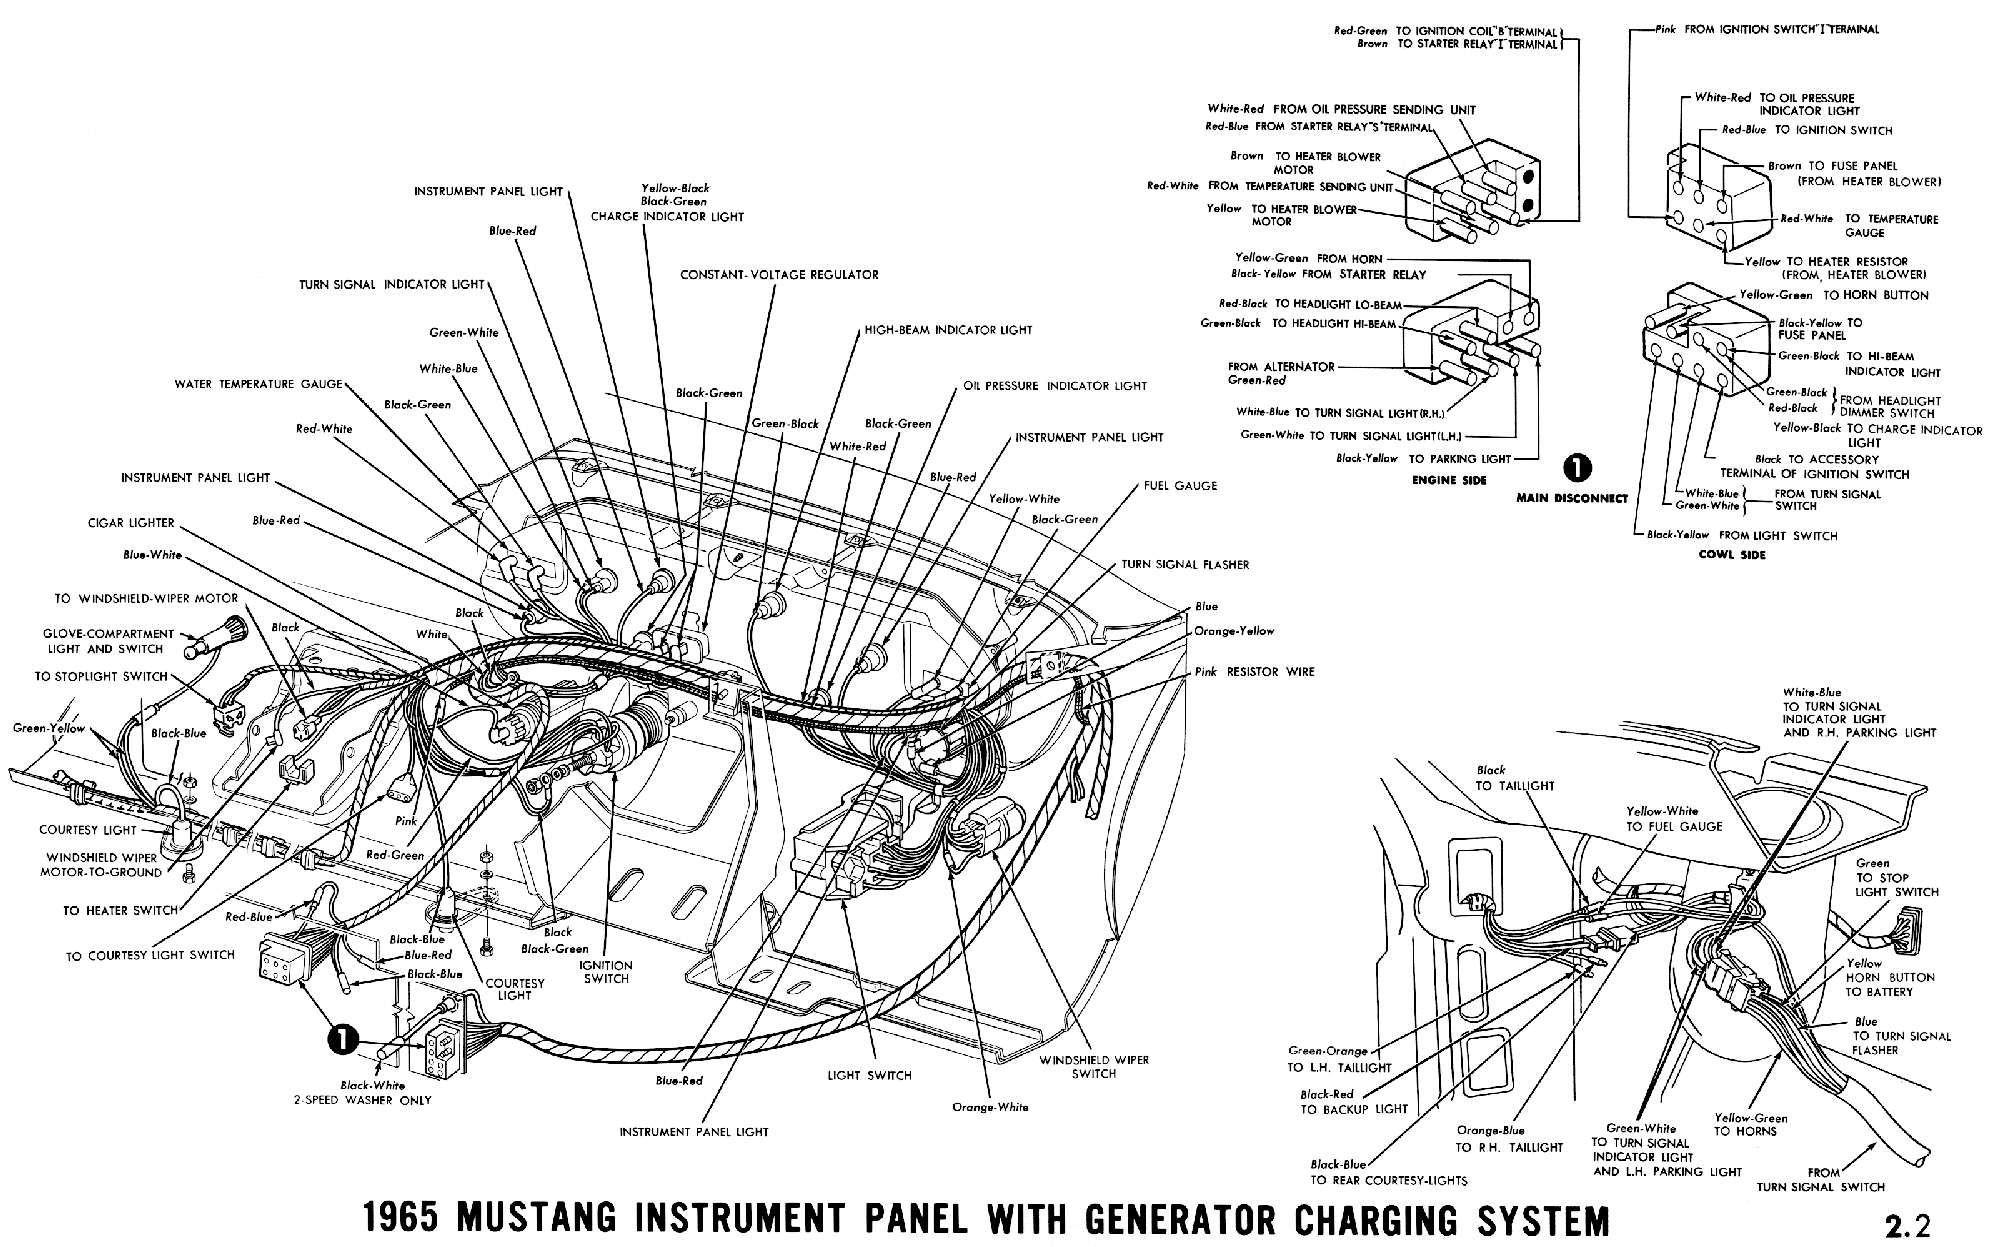 1965 Mustang Wiring Diagrams | Automotive Repair | Mustang